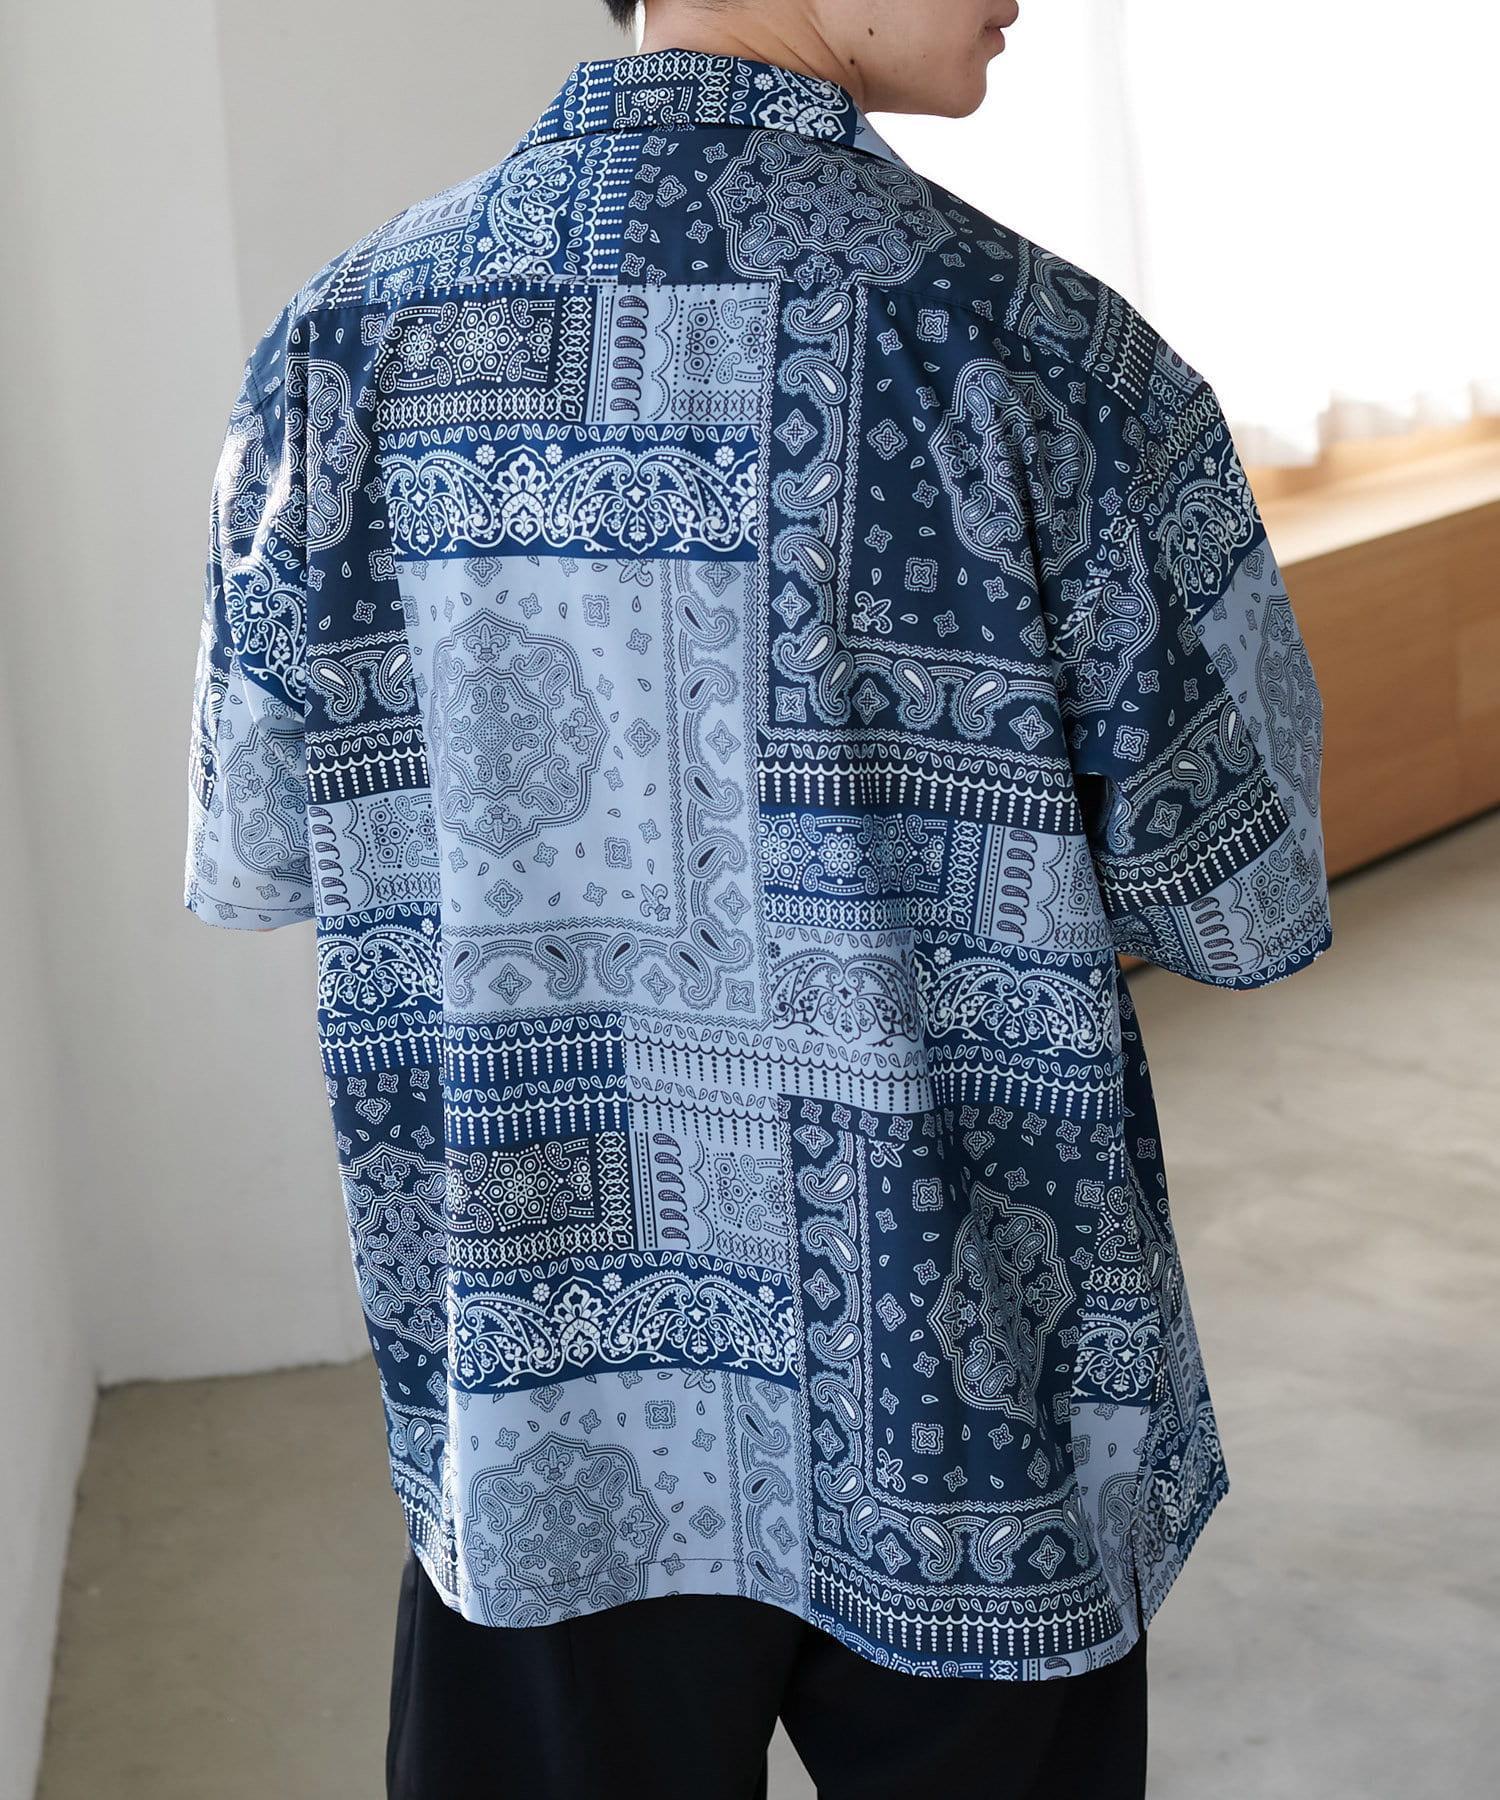 Discoat(ディスコート) ペイズリー/バンダナ柄プリント半袖シャツ